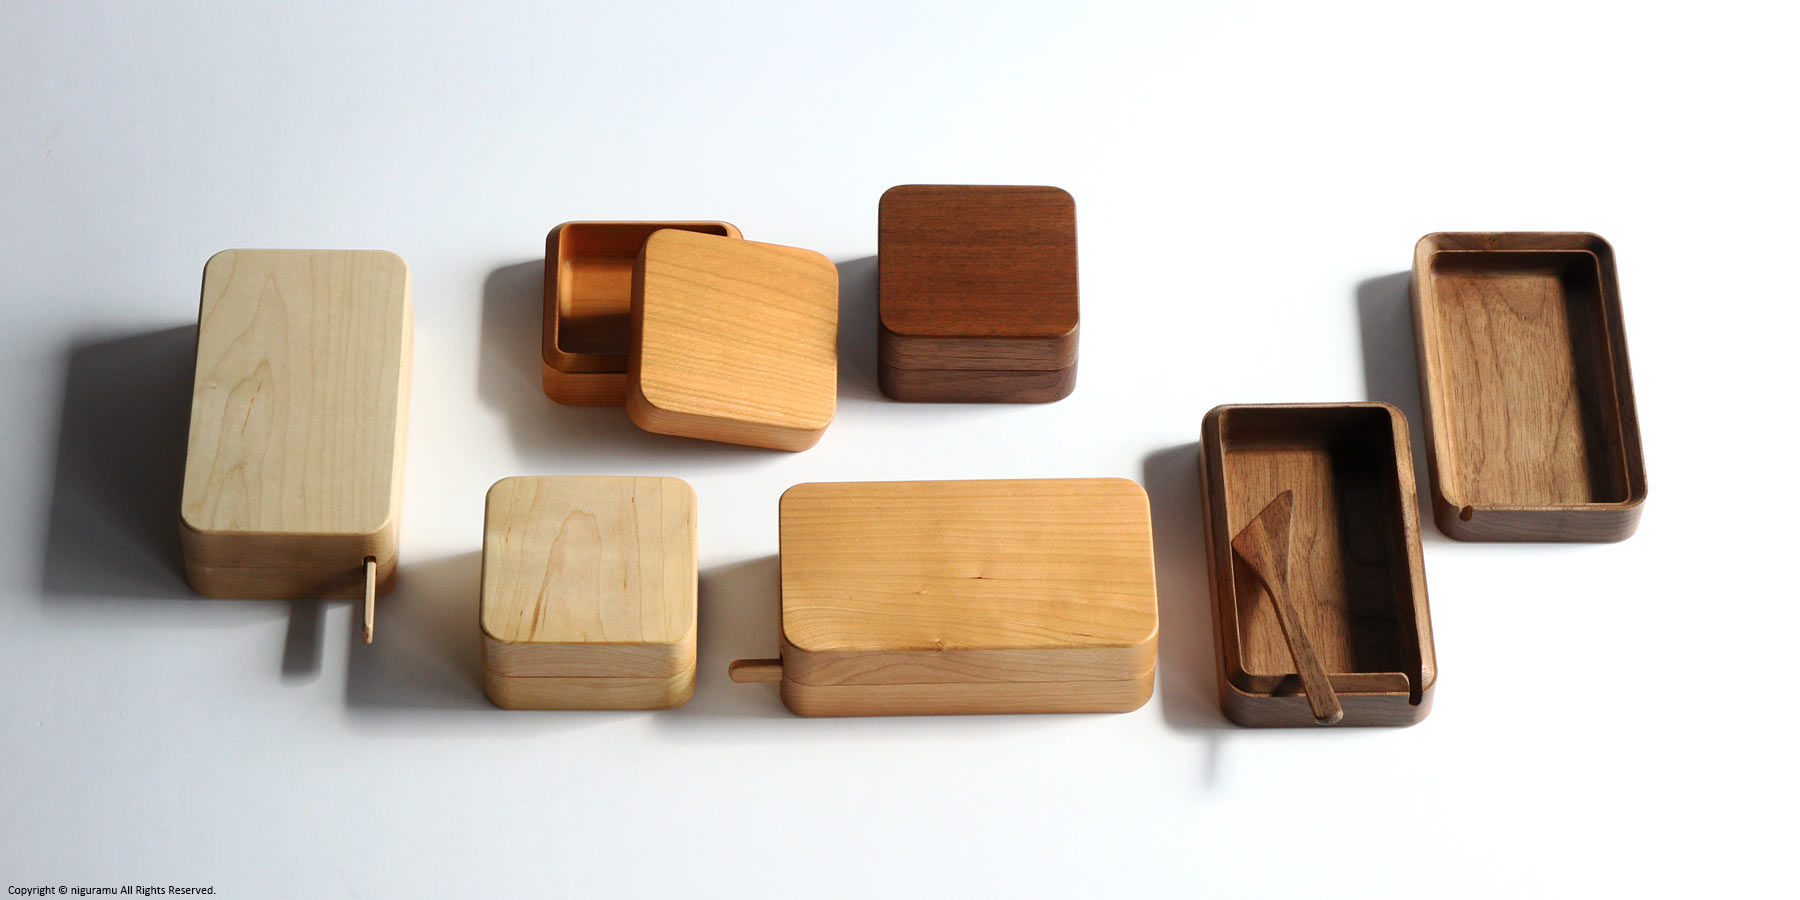 「Kakudo バターケース」レギュラーサイズとハーフサイズ